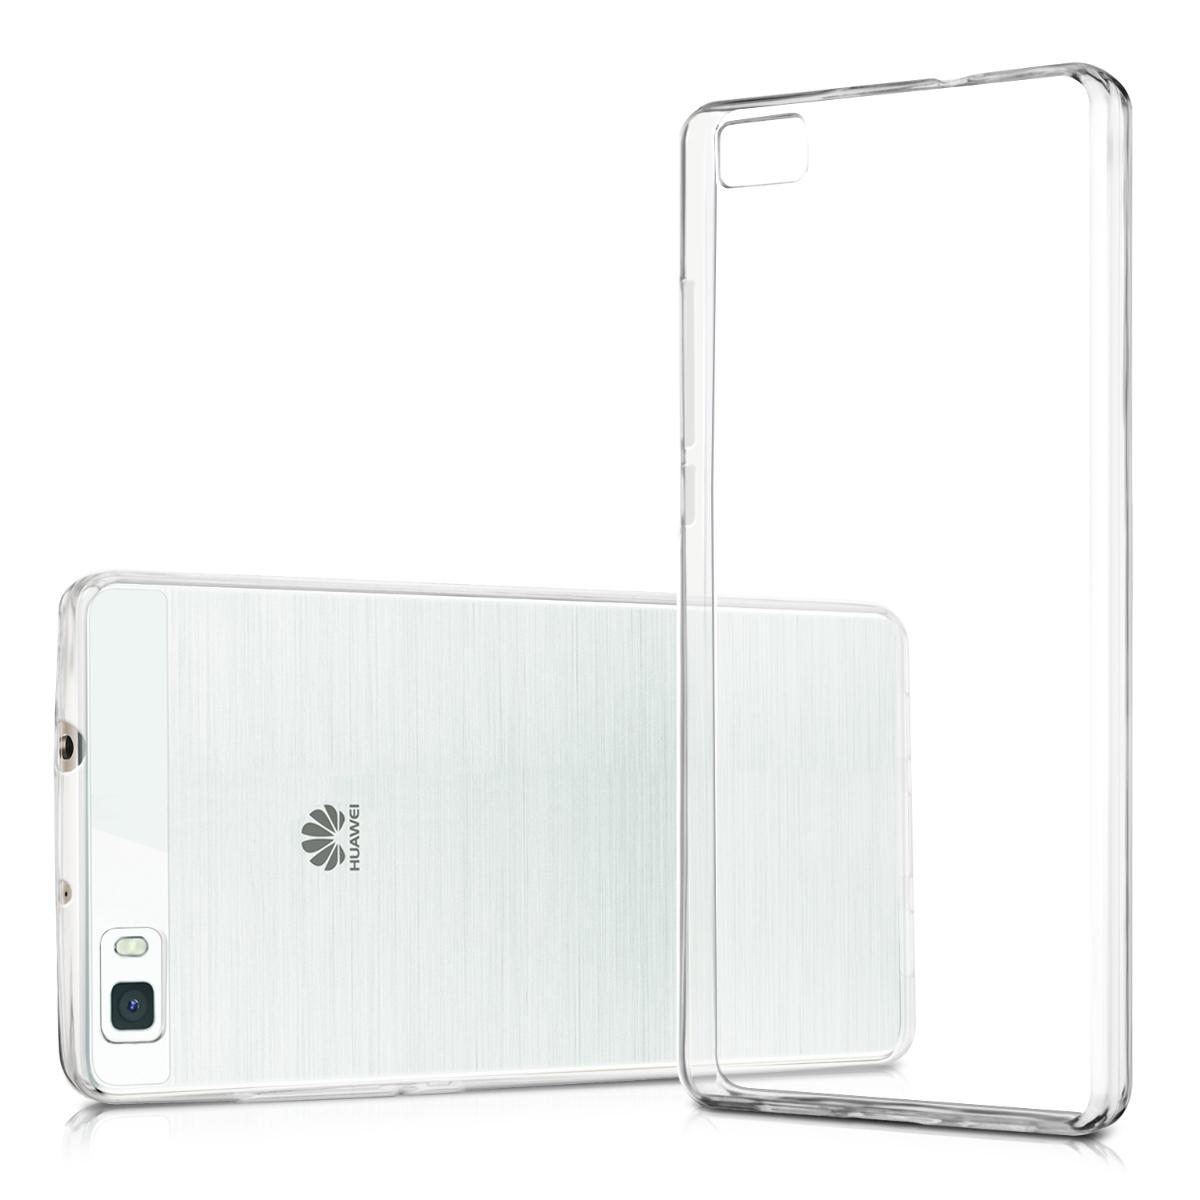 Silikonový kryt pro Huawei P8 Lite